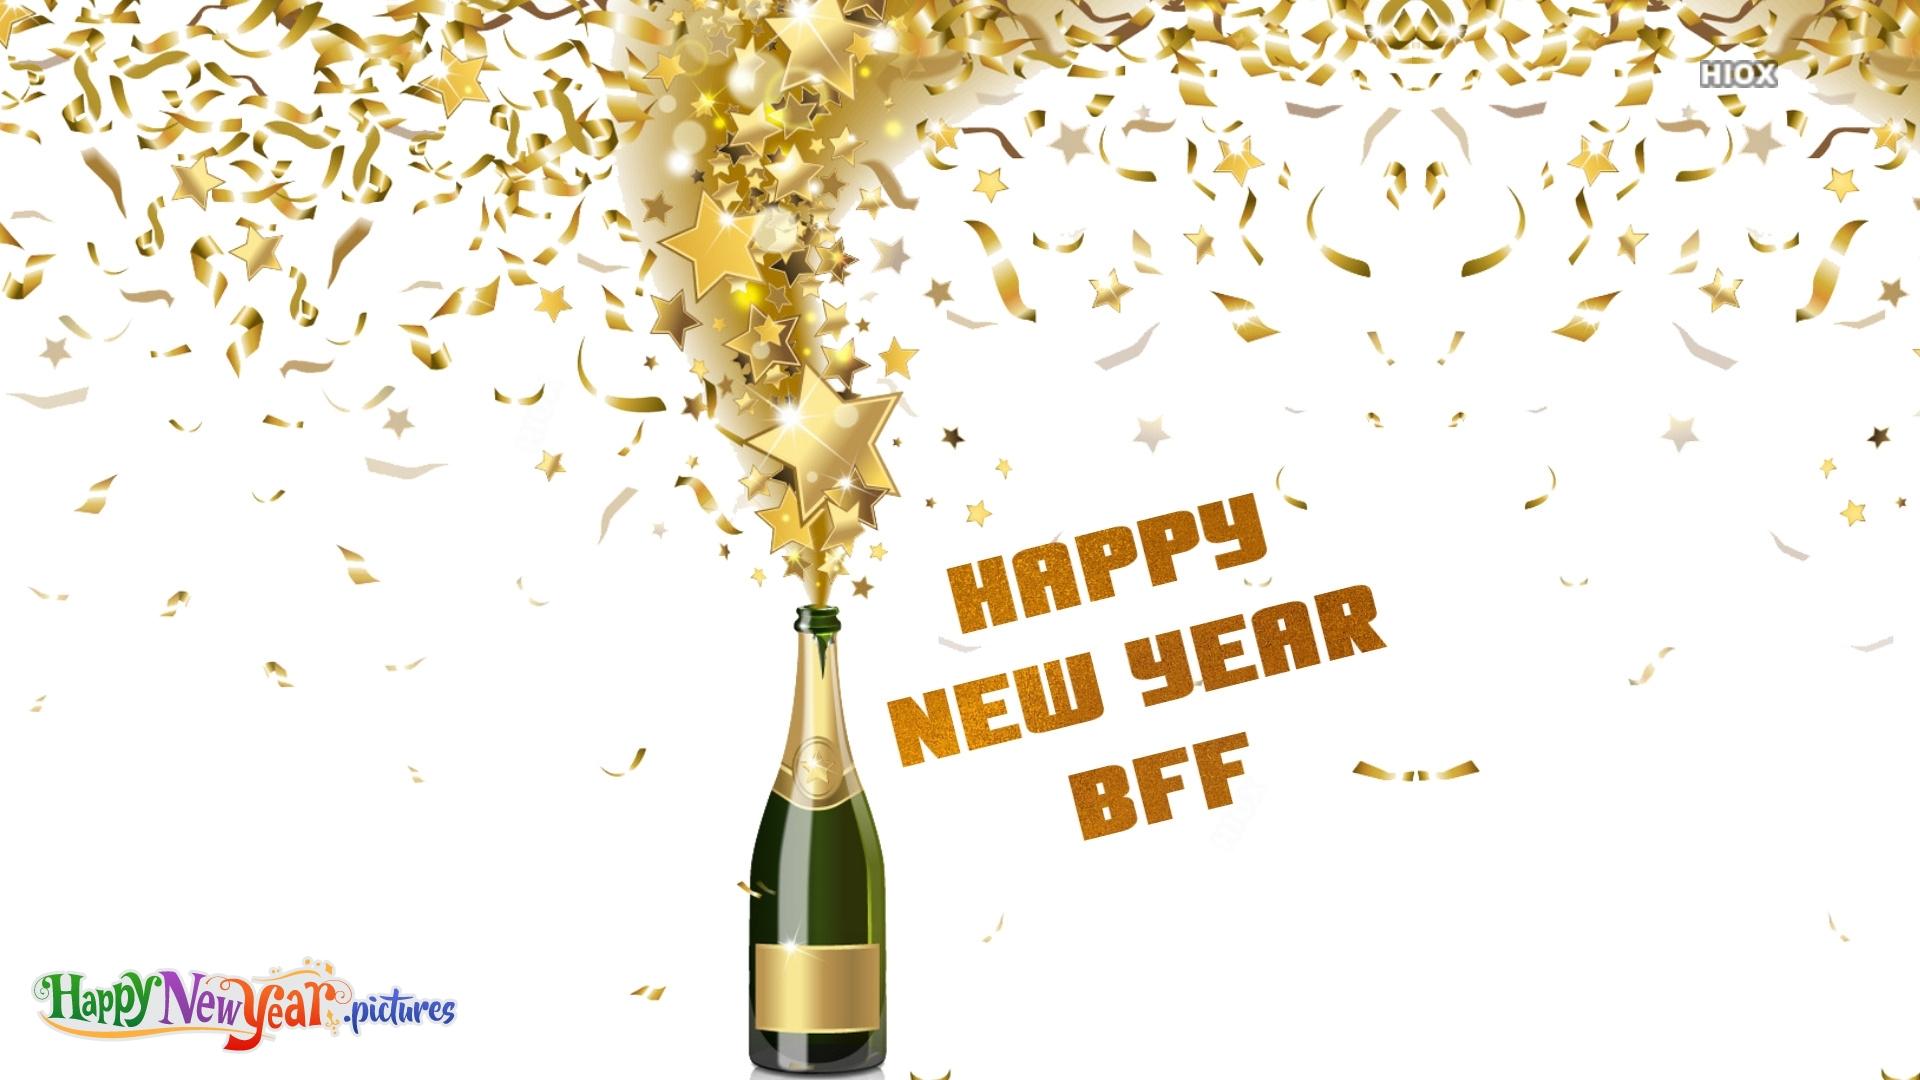 Happy New Year My Bff